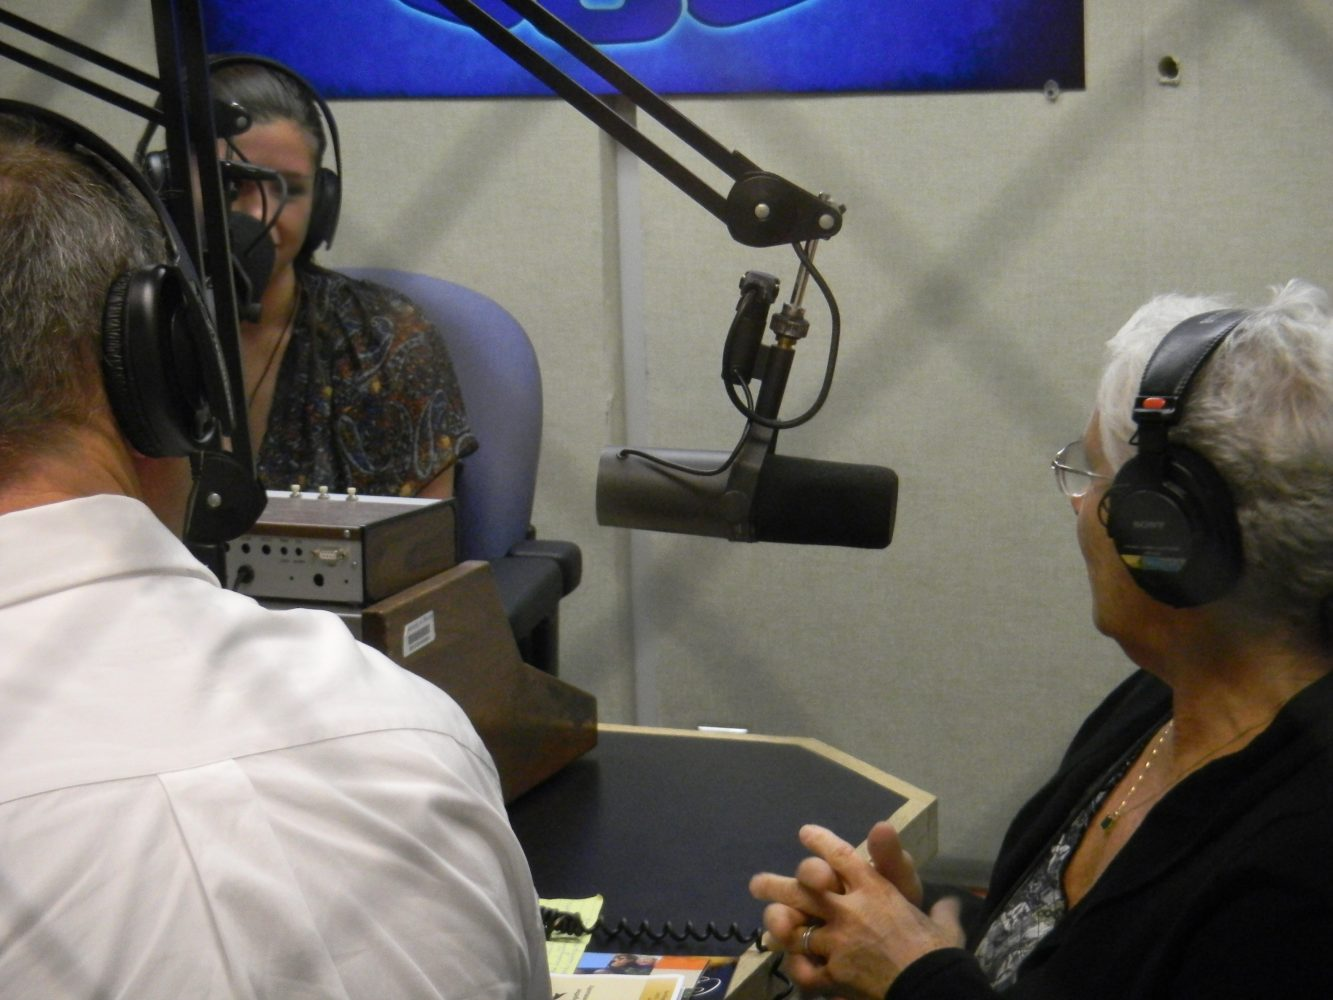 Heart Phoenix being interviewed by WUFT-FM's Kelsey Diaz